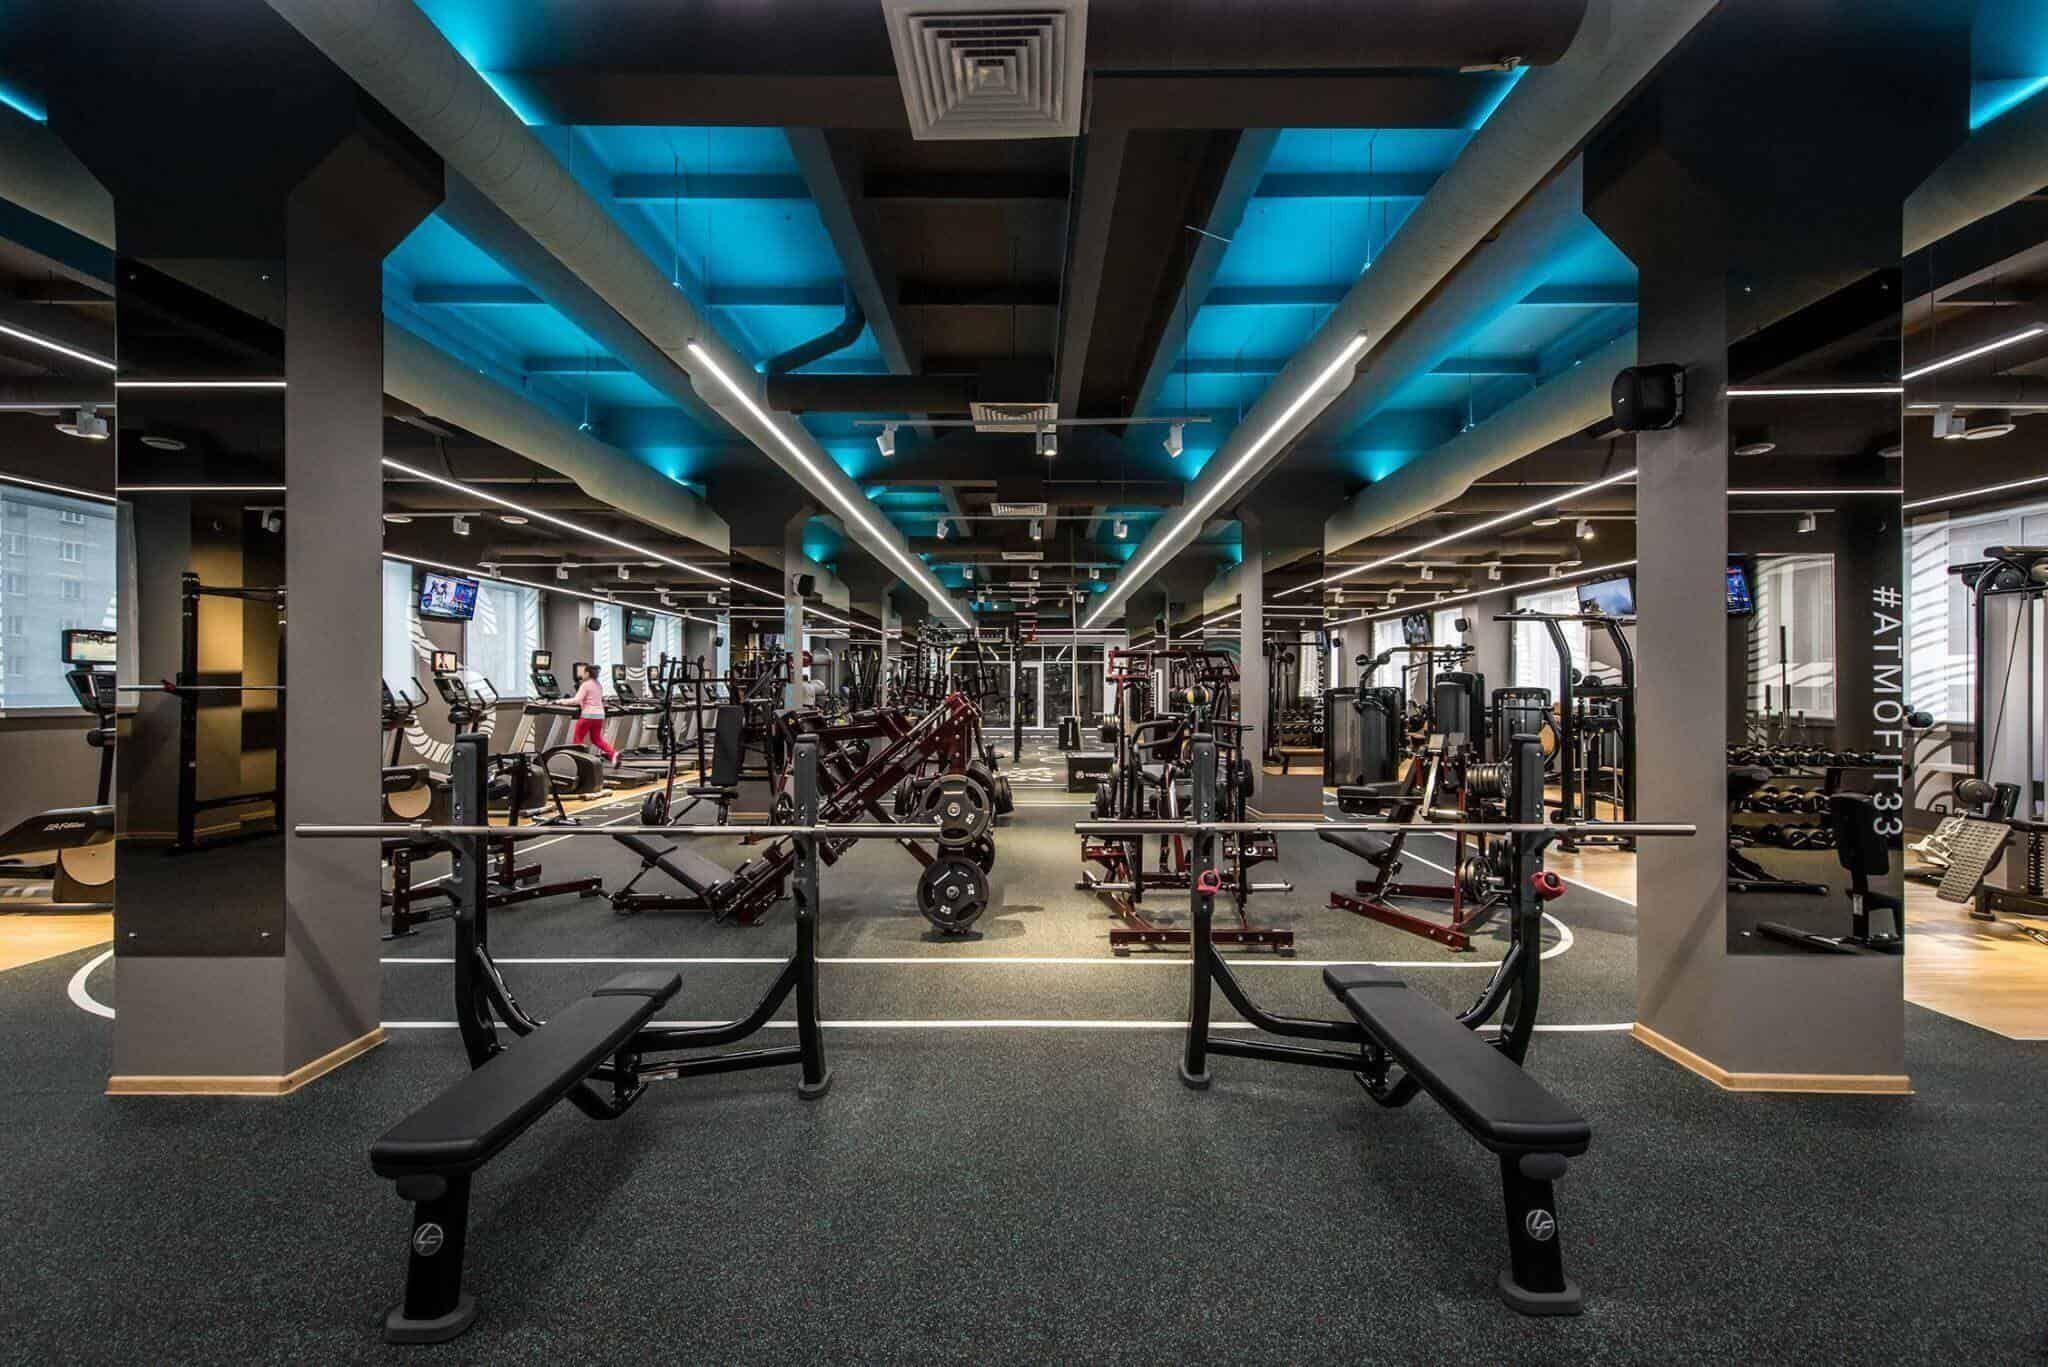 Stylish Gym Interior Decoration Ideas In 2021 Gym Interior Home Gym Design Gym Design